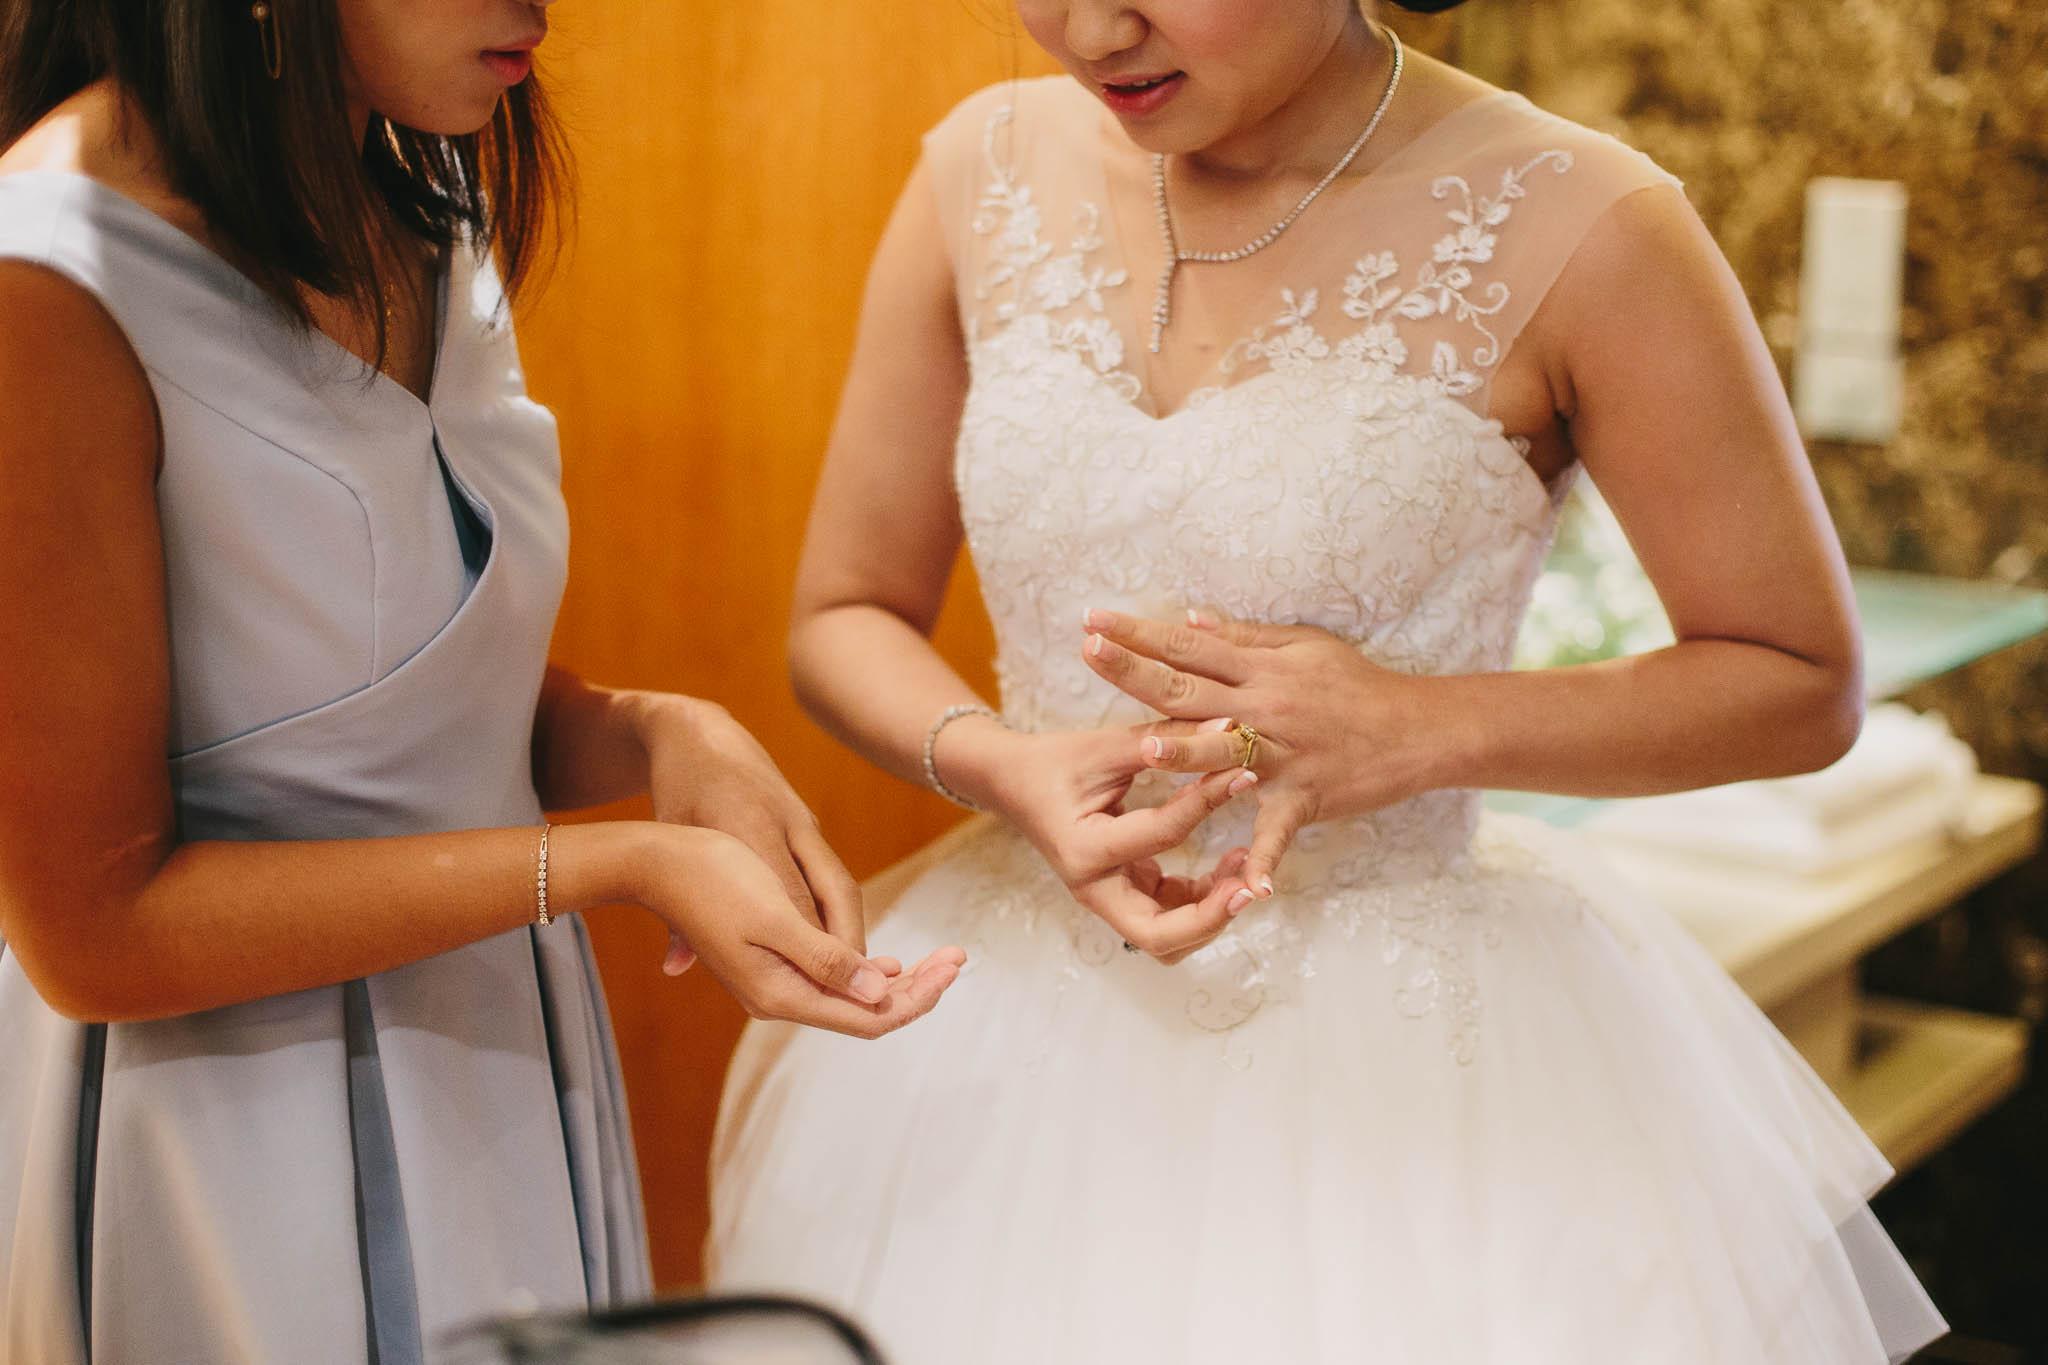 singapore-wedding-photographer-malay-indian-pre-wedding-travel-wmt-2015-jeremy-larissa-09.jpg